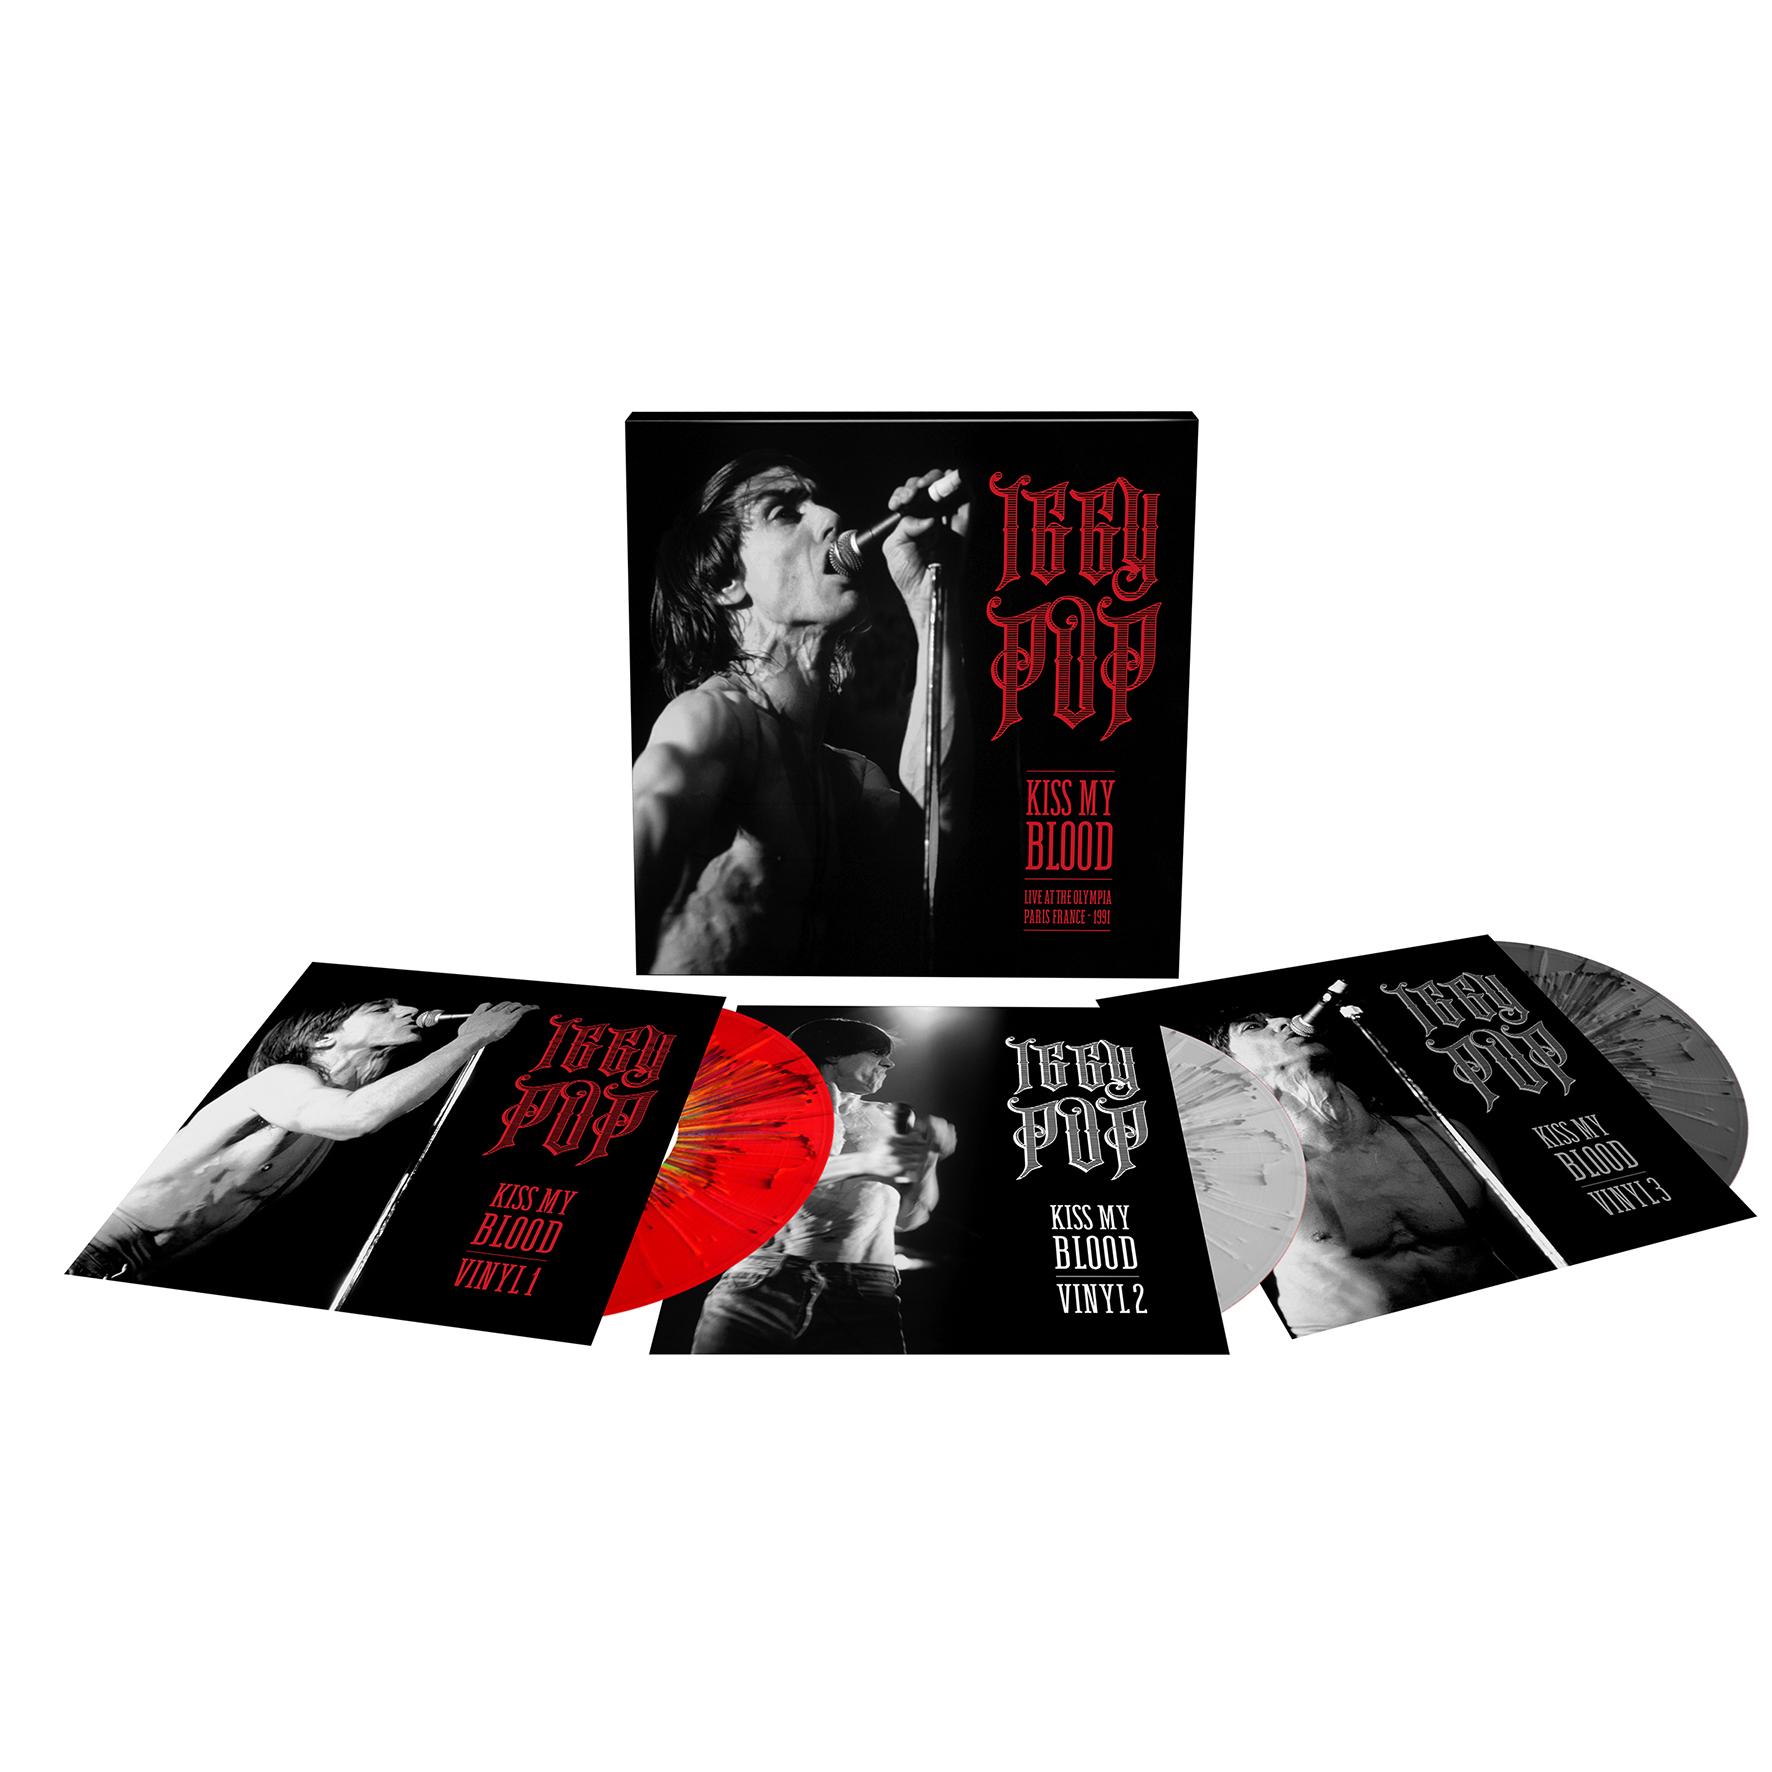 Kiss My Blood (Live In Paris 1991) (Red / White Splatter Vinyl) - Iggy Pop - Musik - L.M.L.R. - 3700477831783 - August 29, 2020